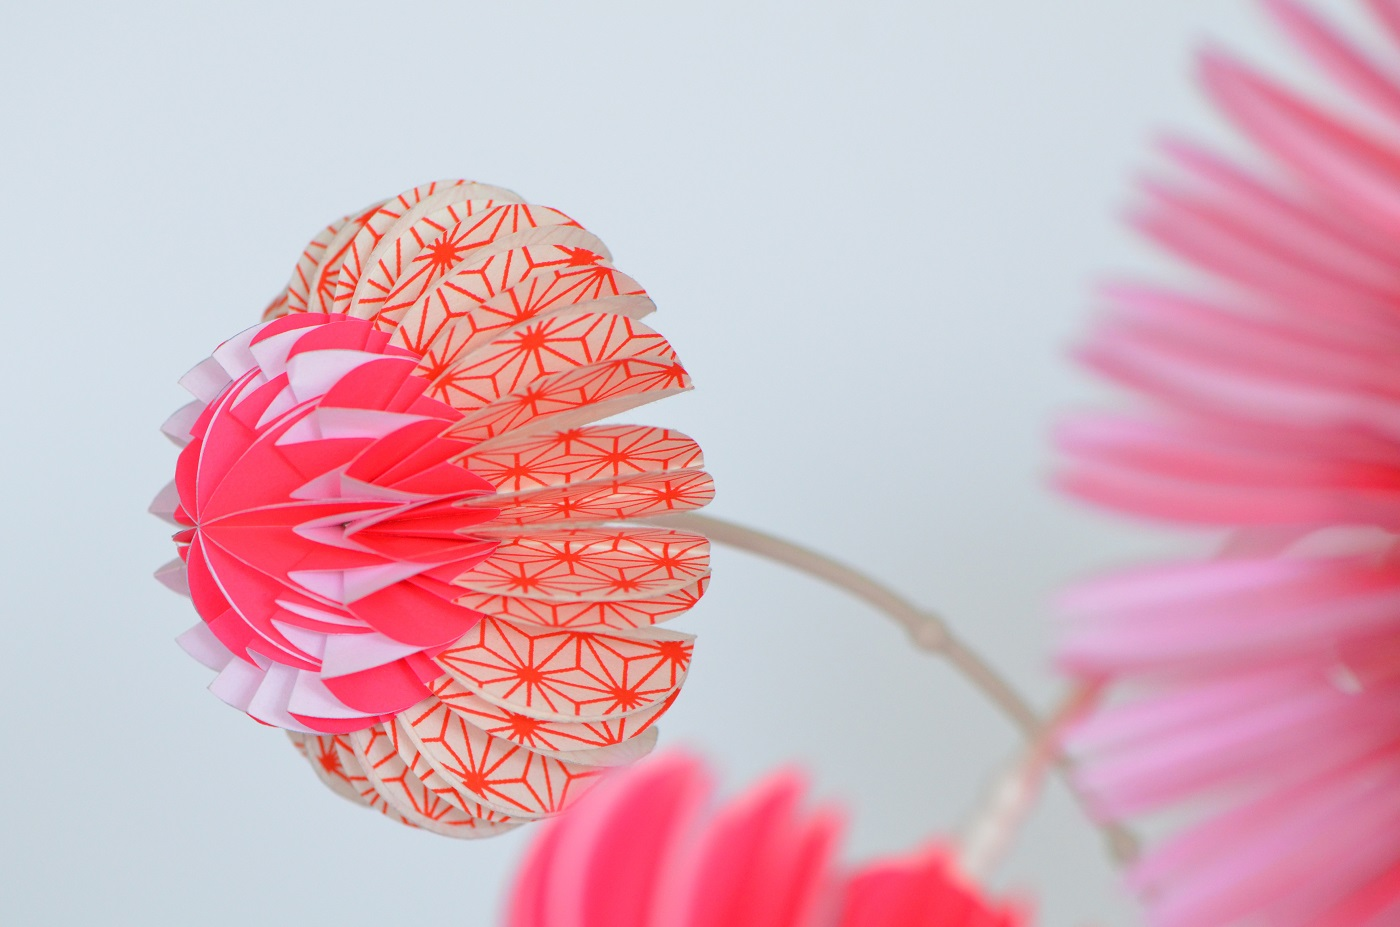 Paperflowers roze van Jorine Oosterhoff in Gimmii Magazine